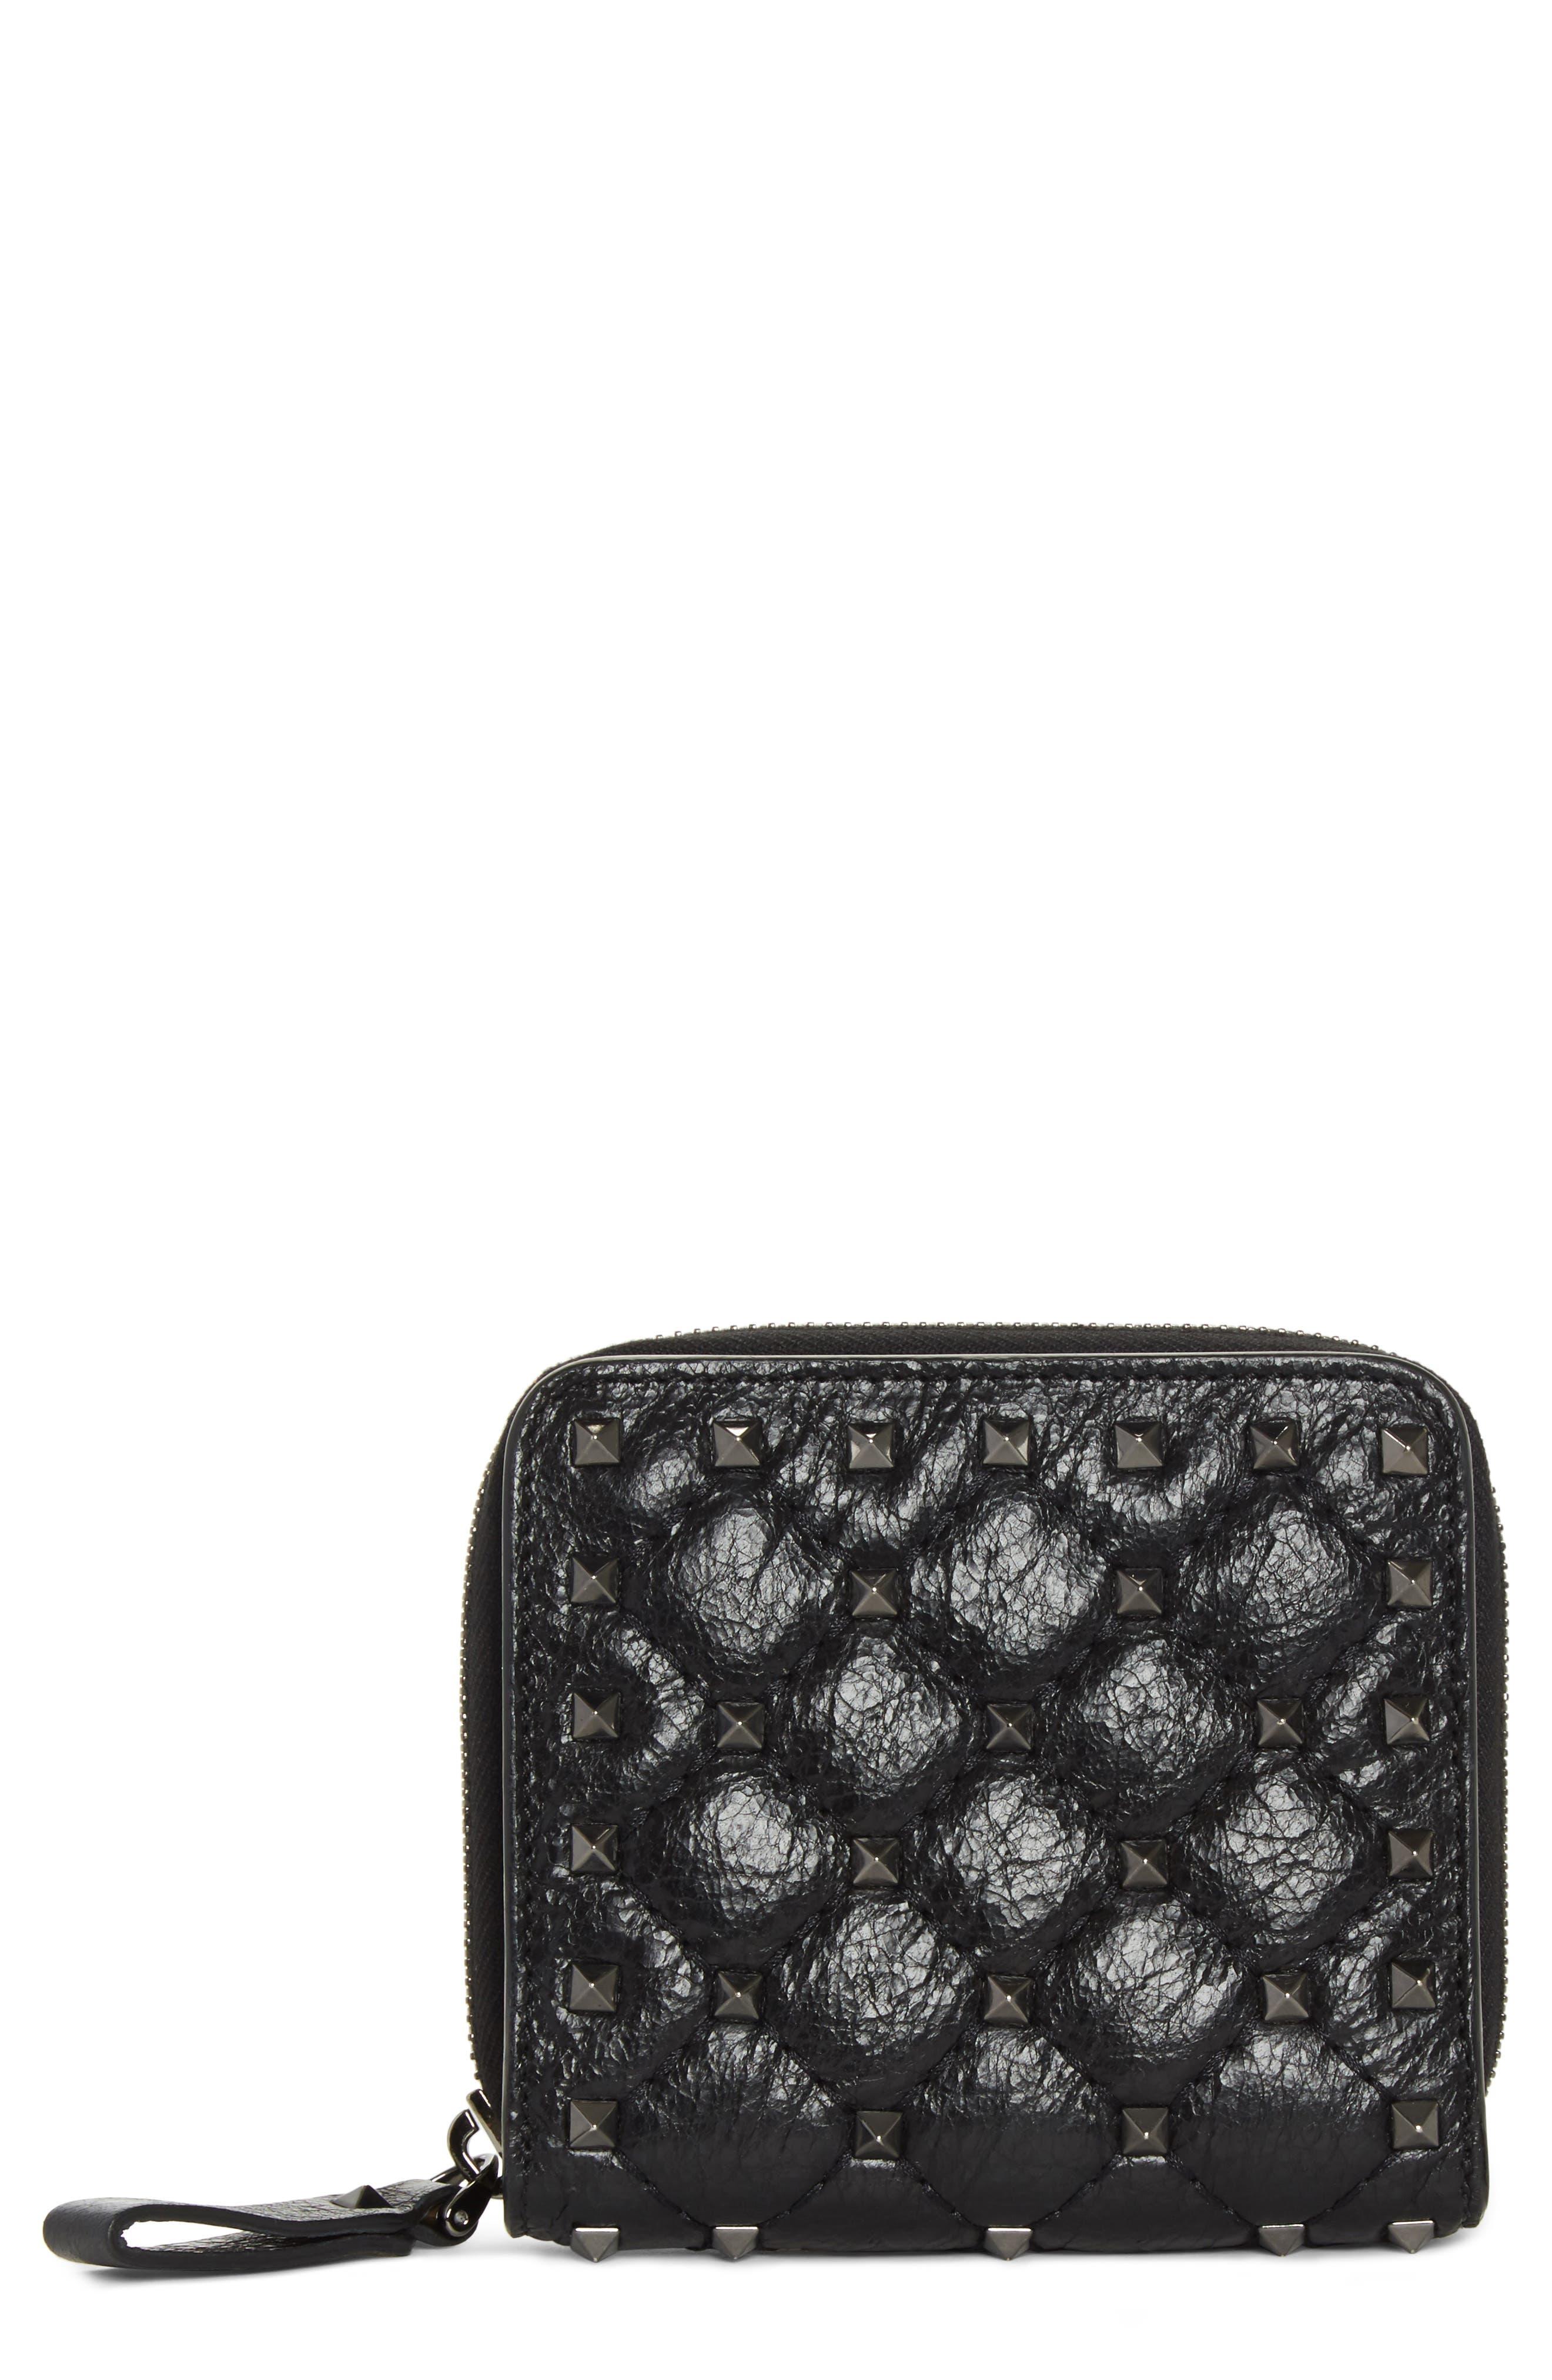 VALENTINO GARAVANI Rockstud Leather French Wallet